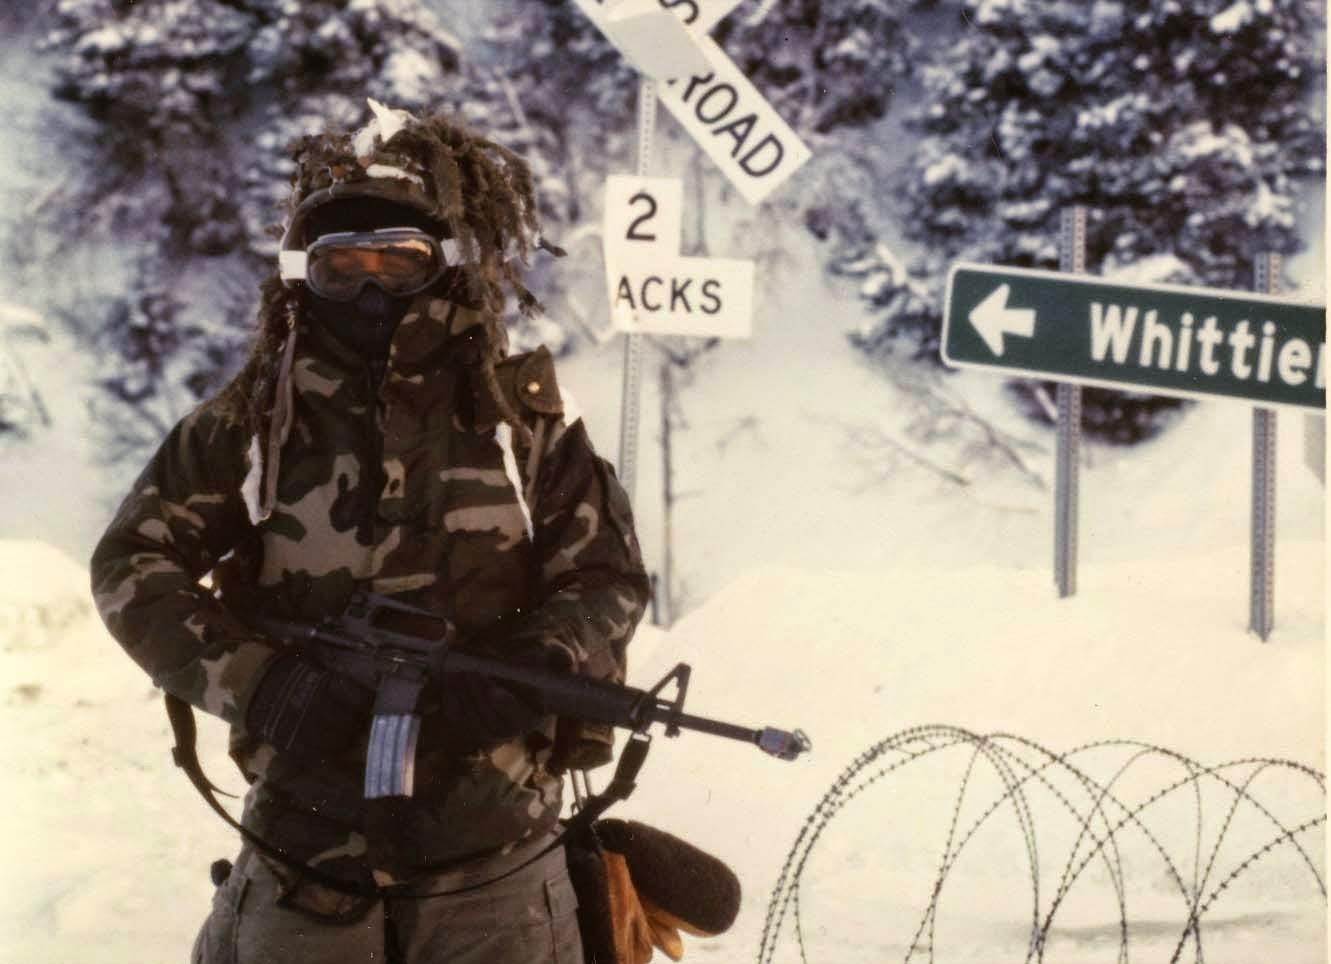 Specialist Kevin Breen, 2nd Batt. 17th Inf. Fort Richardson, Alaska, Feb. 1989